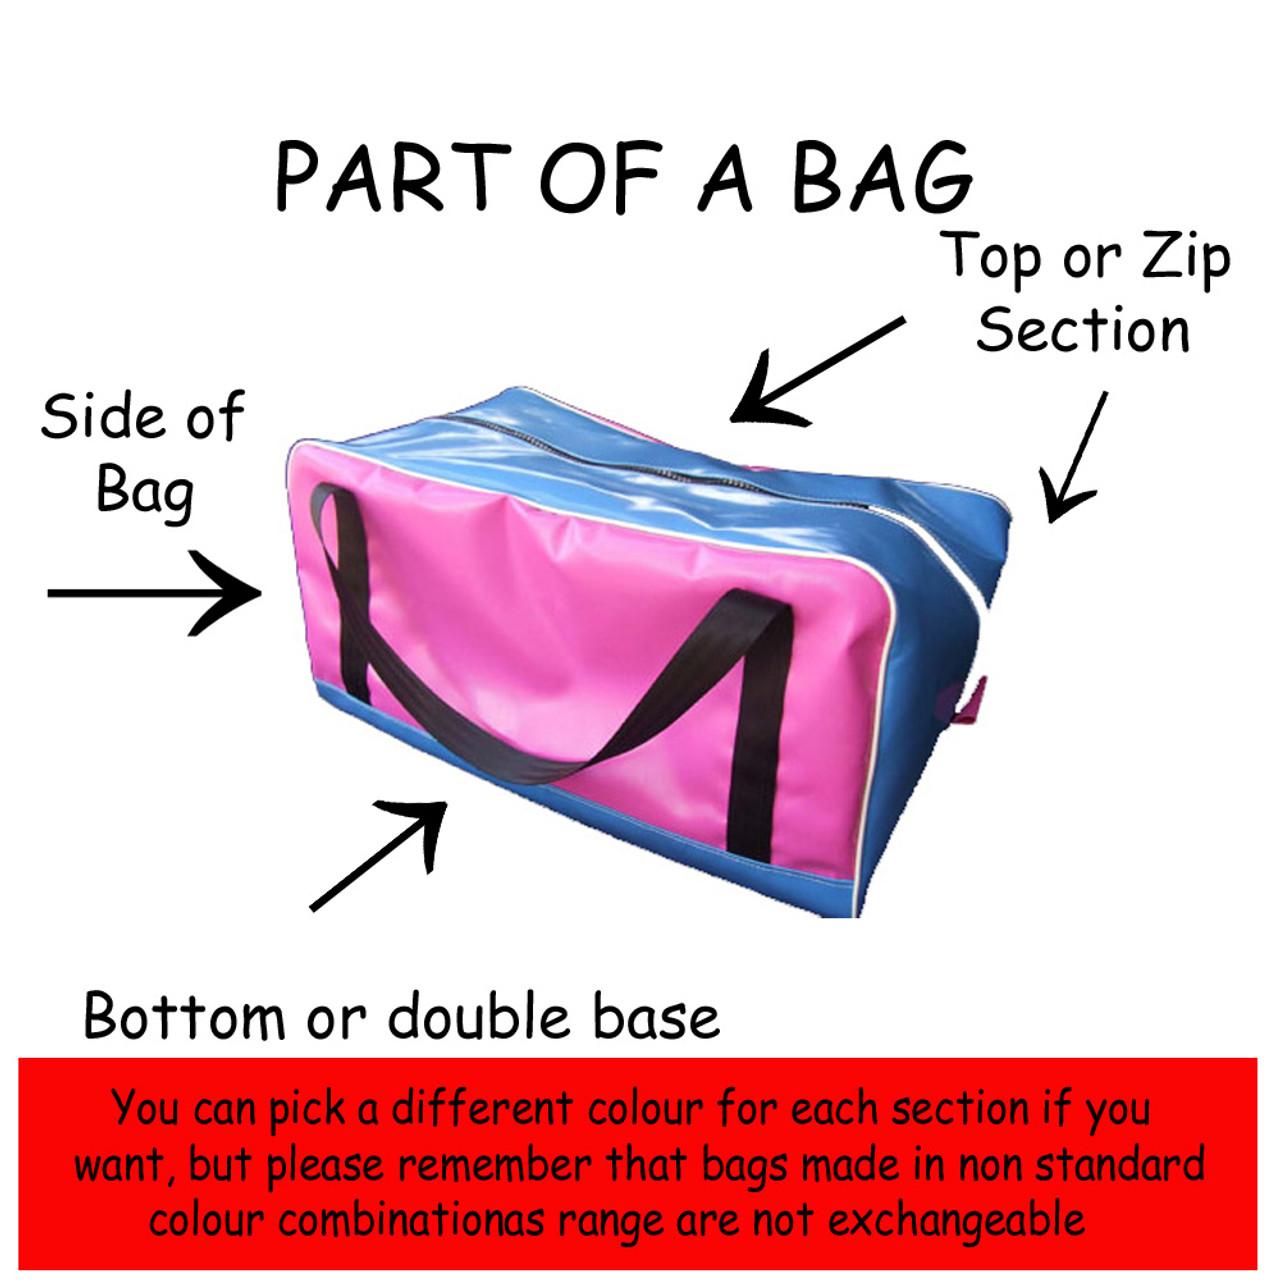 Travel Mate Bag Oil cloth Australian Made 52cmL X 28cmW X 25cm H